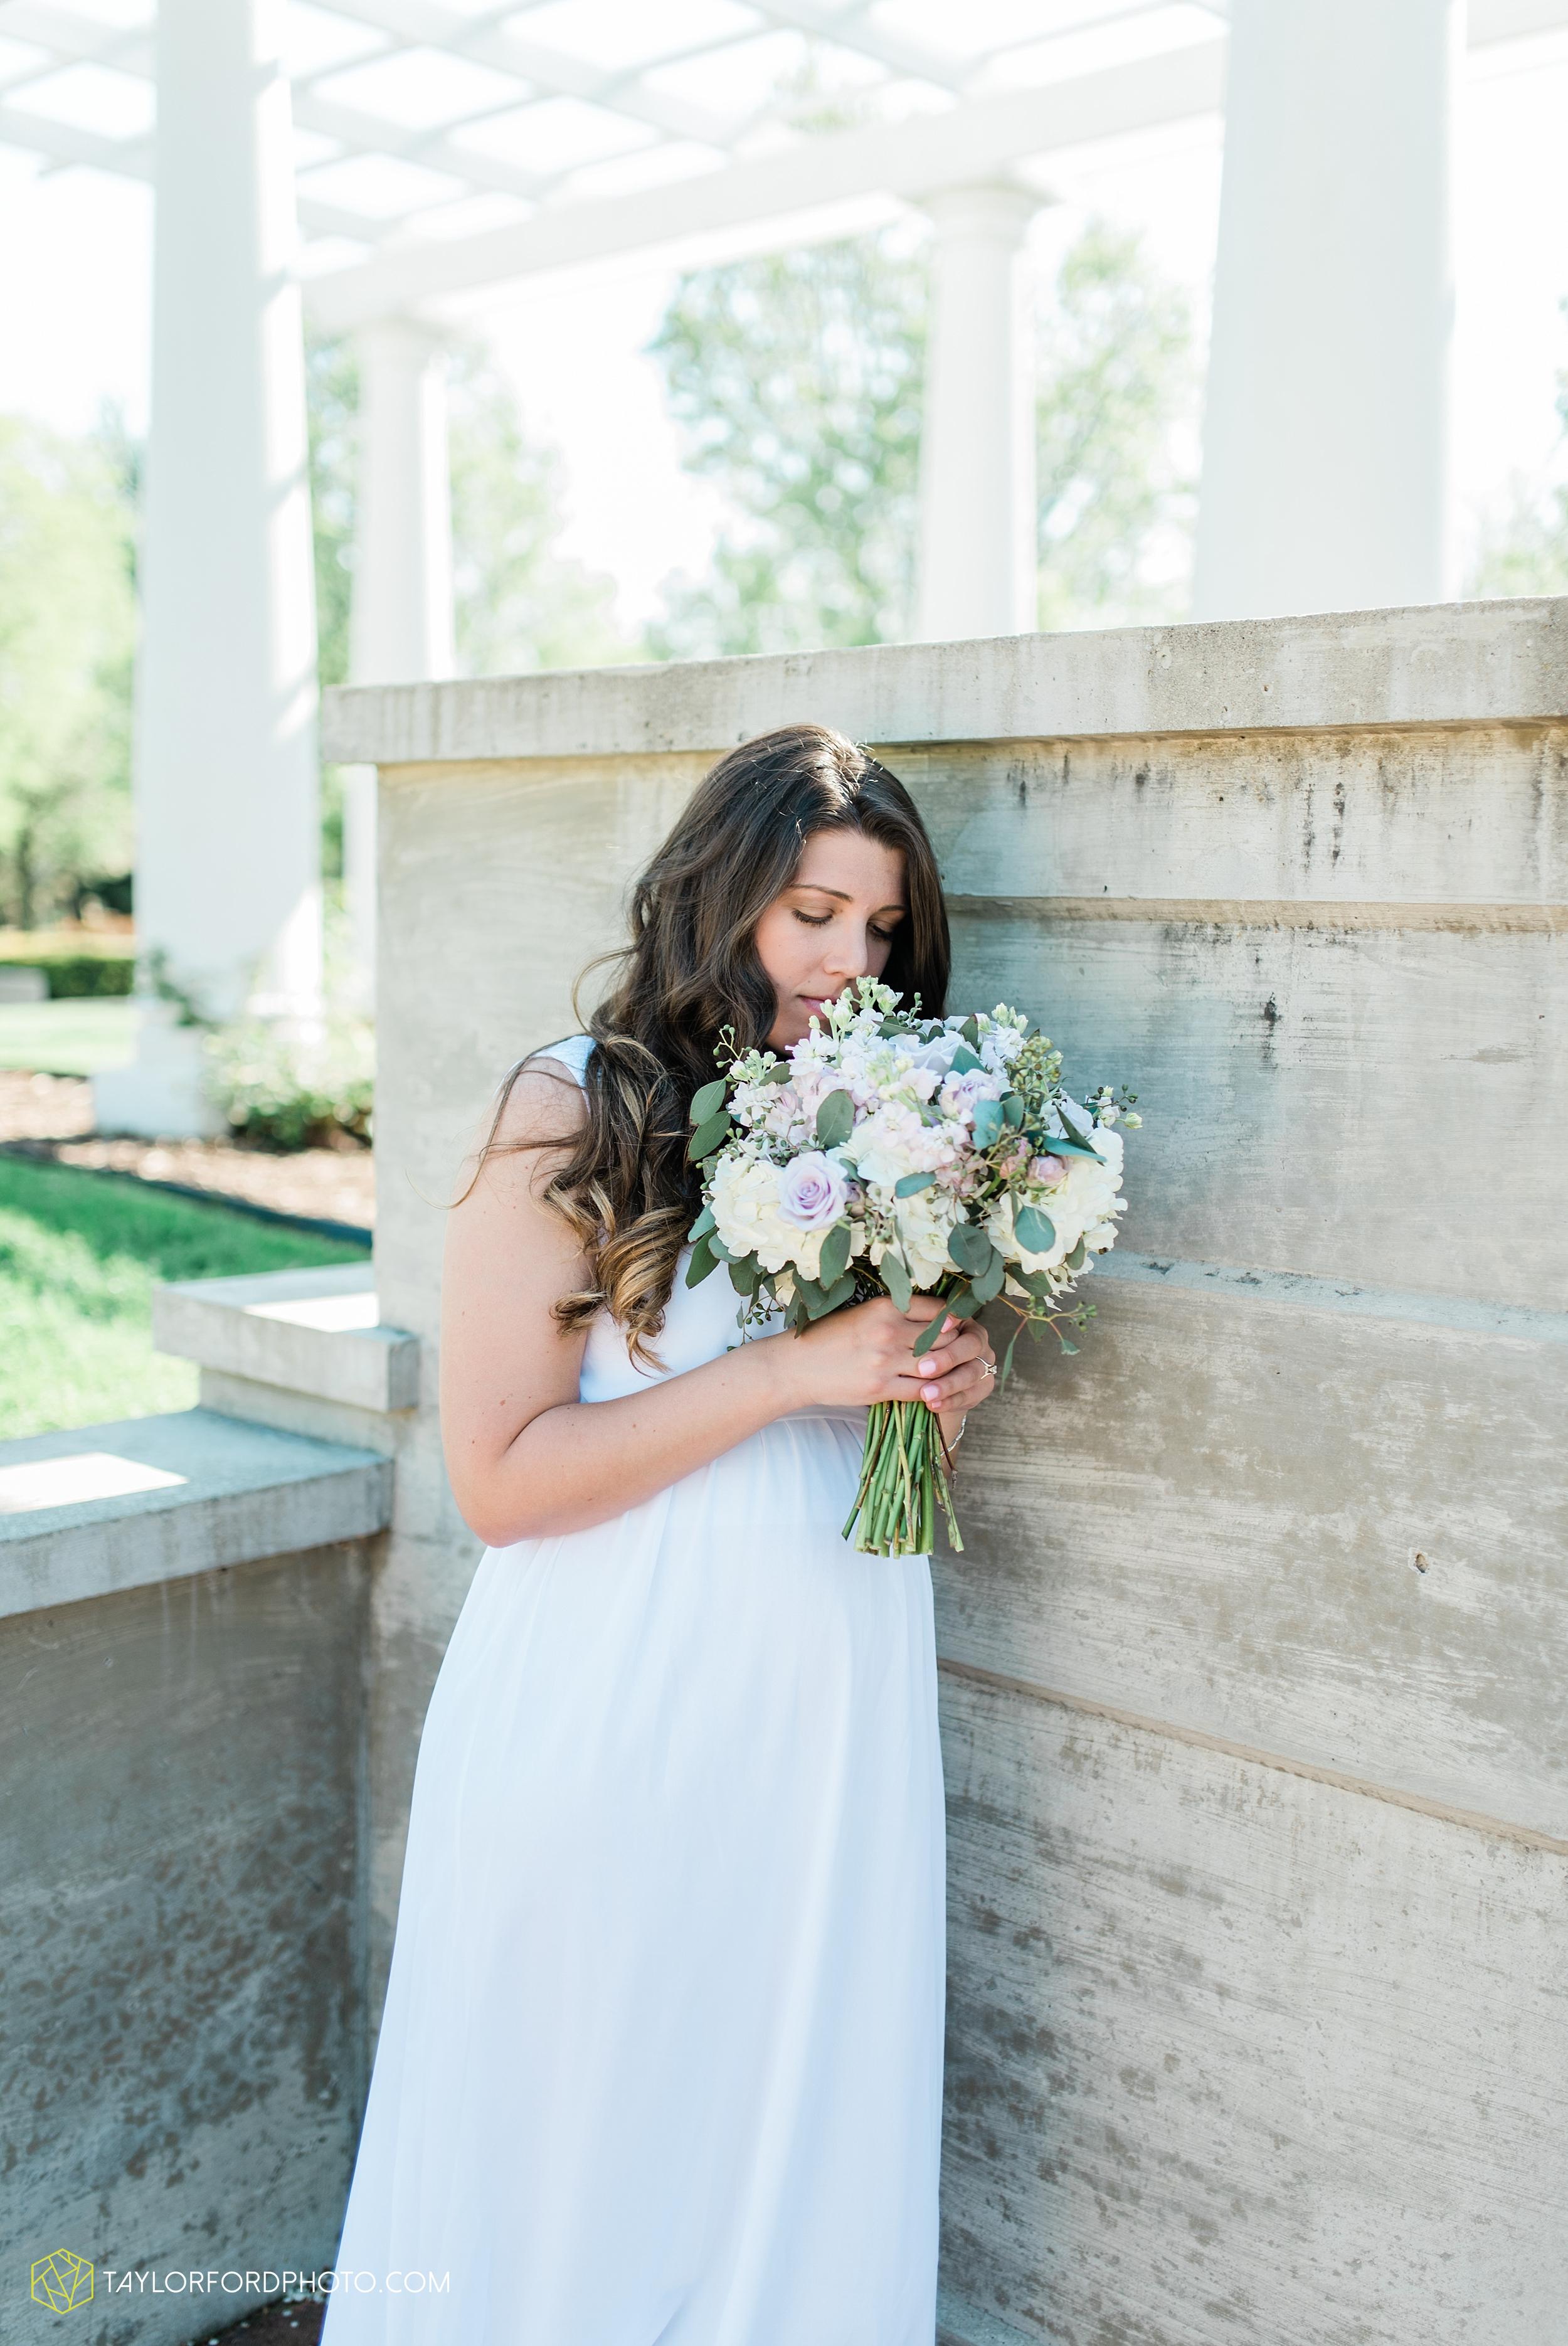 lakeside-rose-gardens-fort-wayne-indiana-elopement-wedding-photographer-Taylor-Ford-Photography_7159.jpg